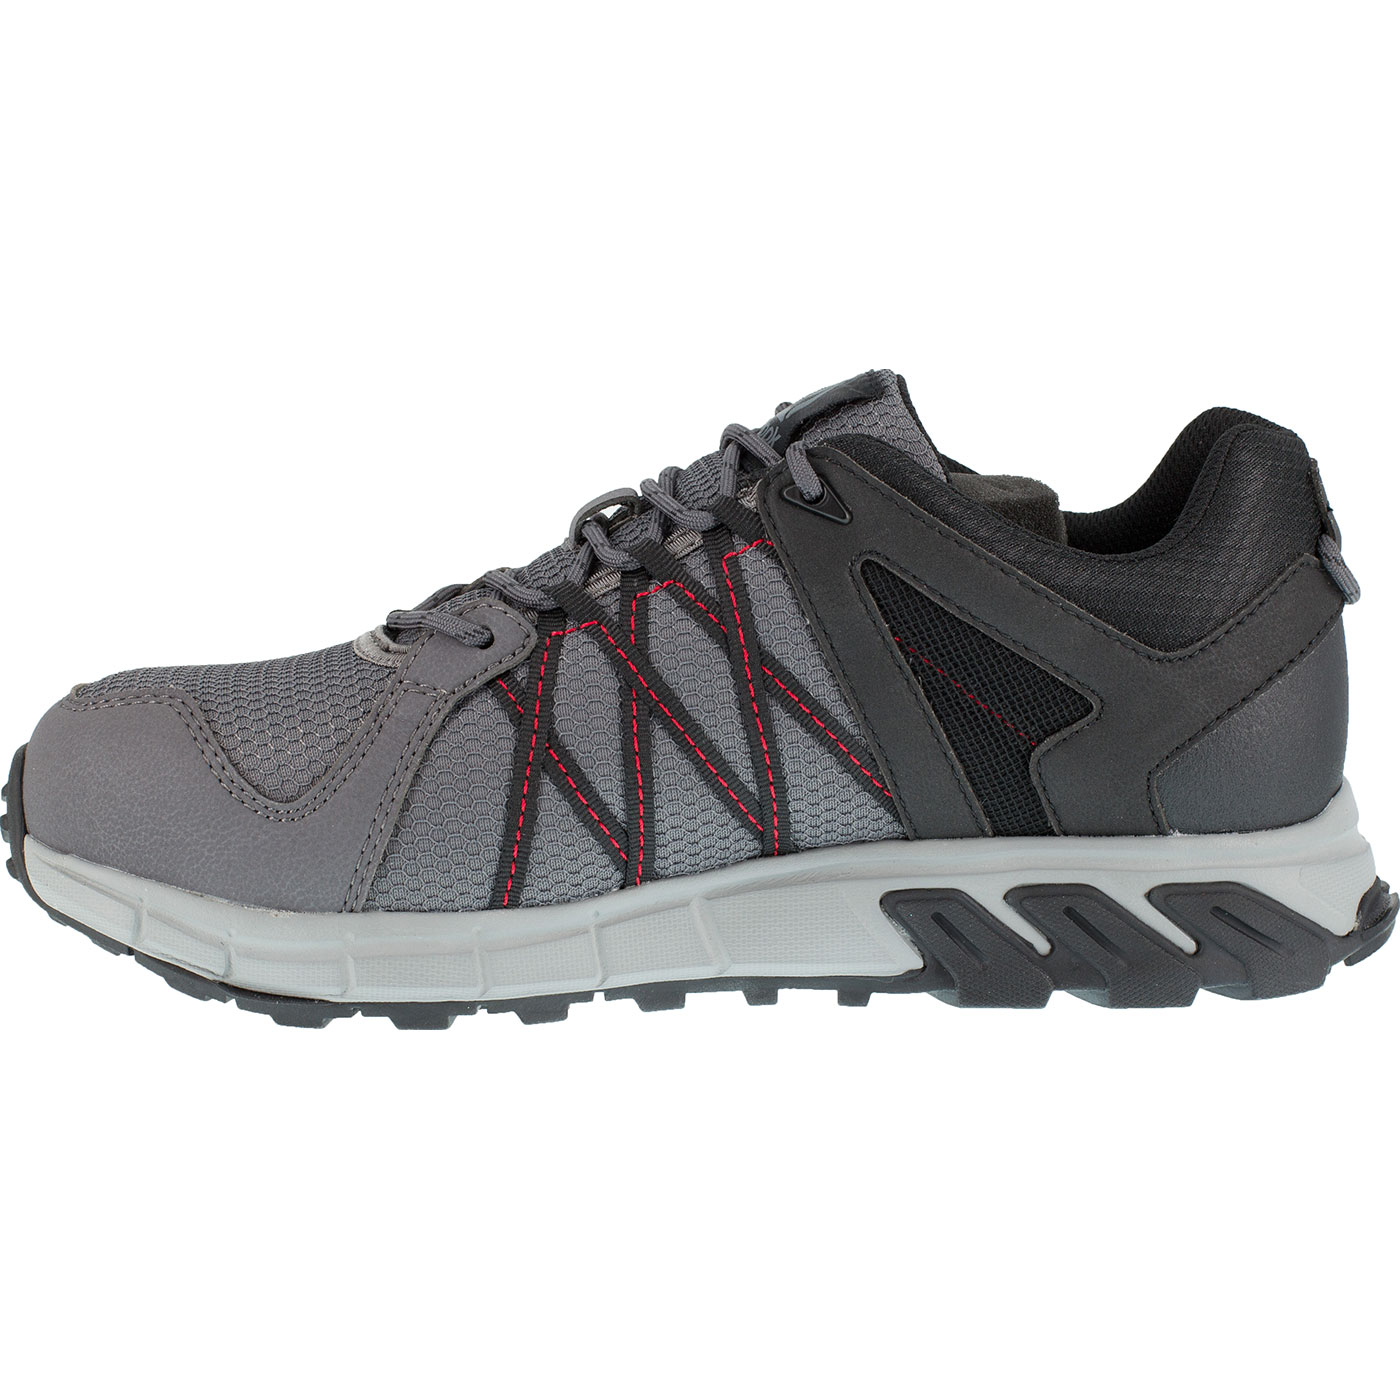 104755915cd Loading zoom. Reebok Trailgrip Work Men s Alloy Toe Electrical Hazard  Athletic Shoe